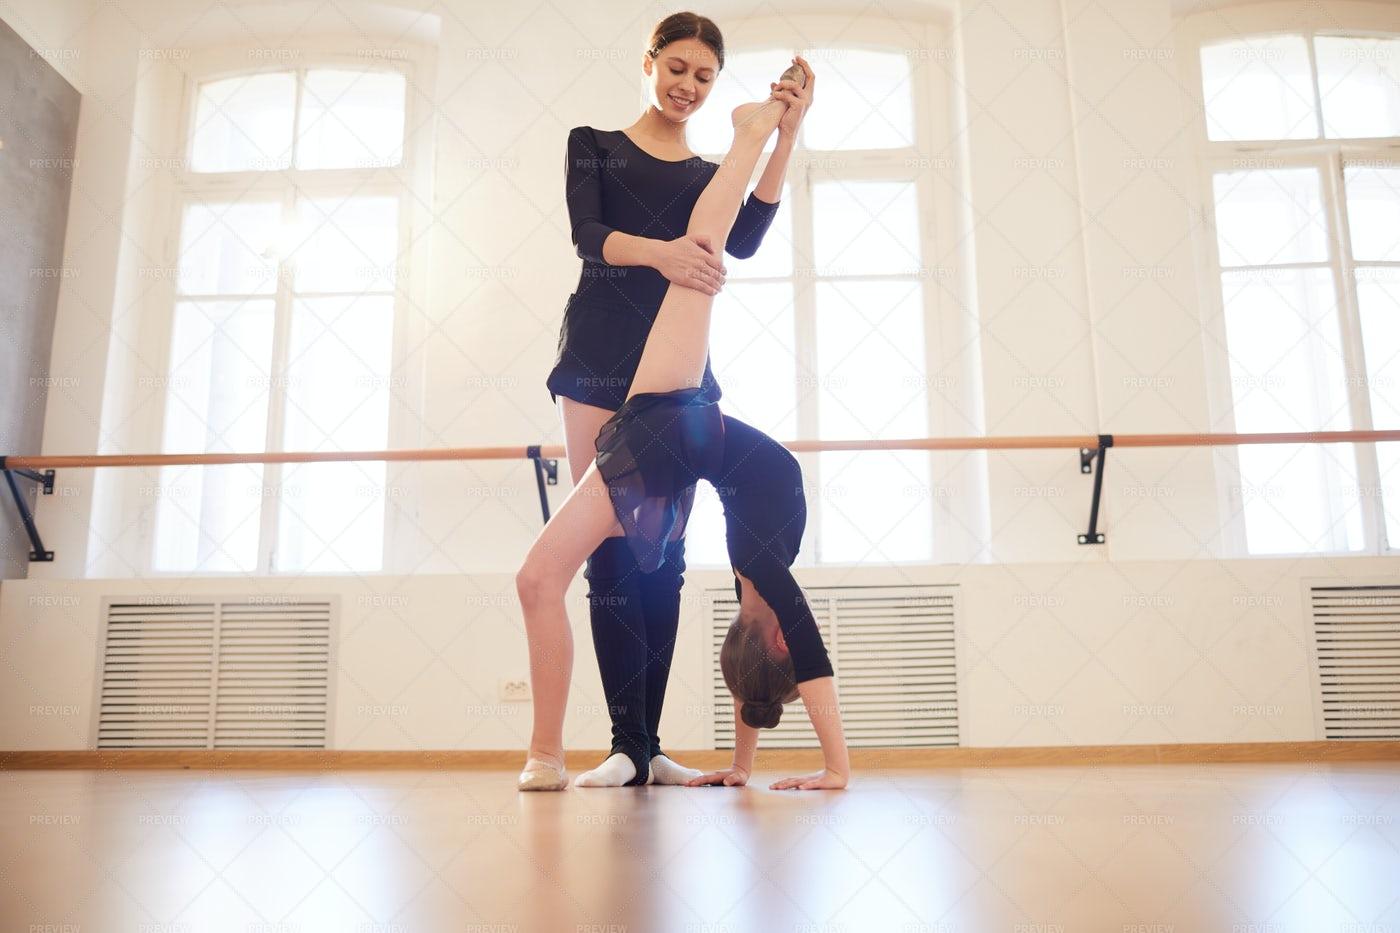 Choreogrpher Working With Gymnast: Stock Photos